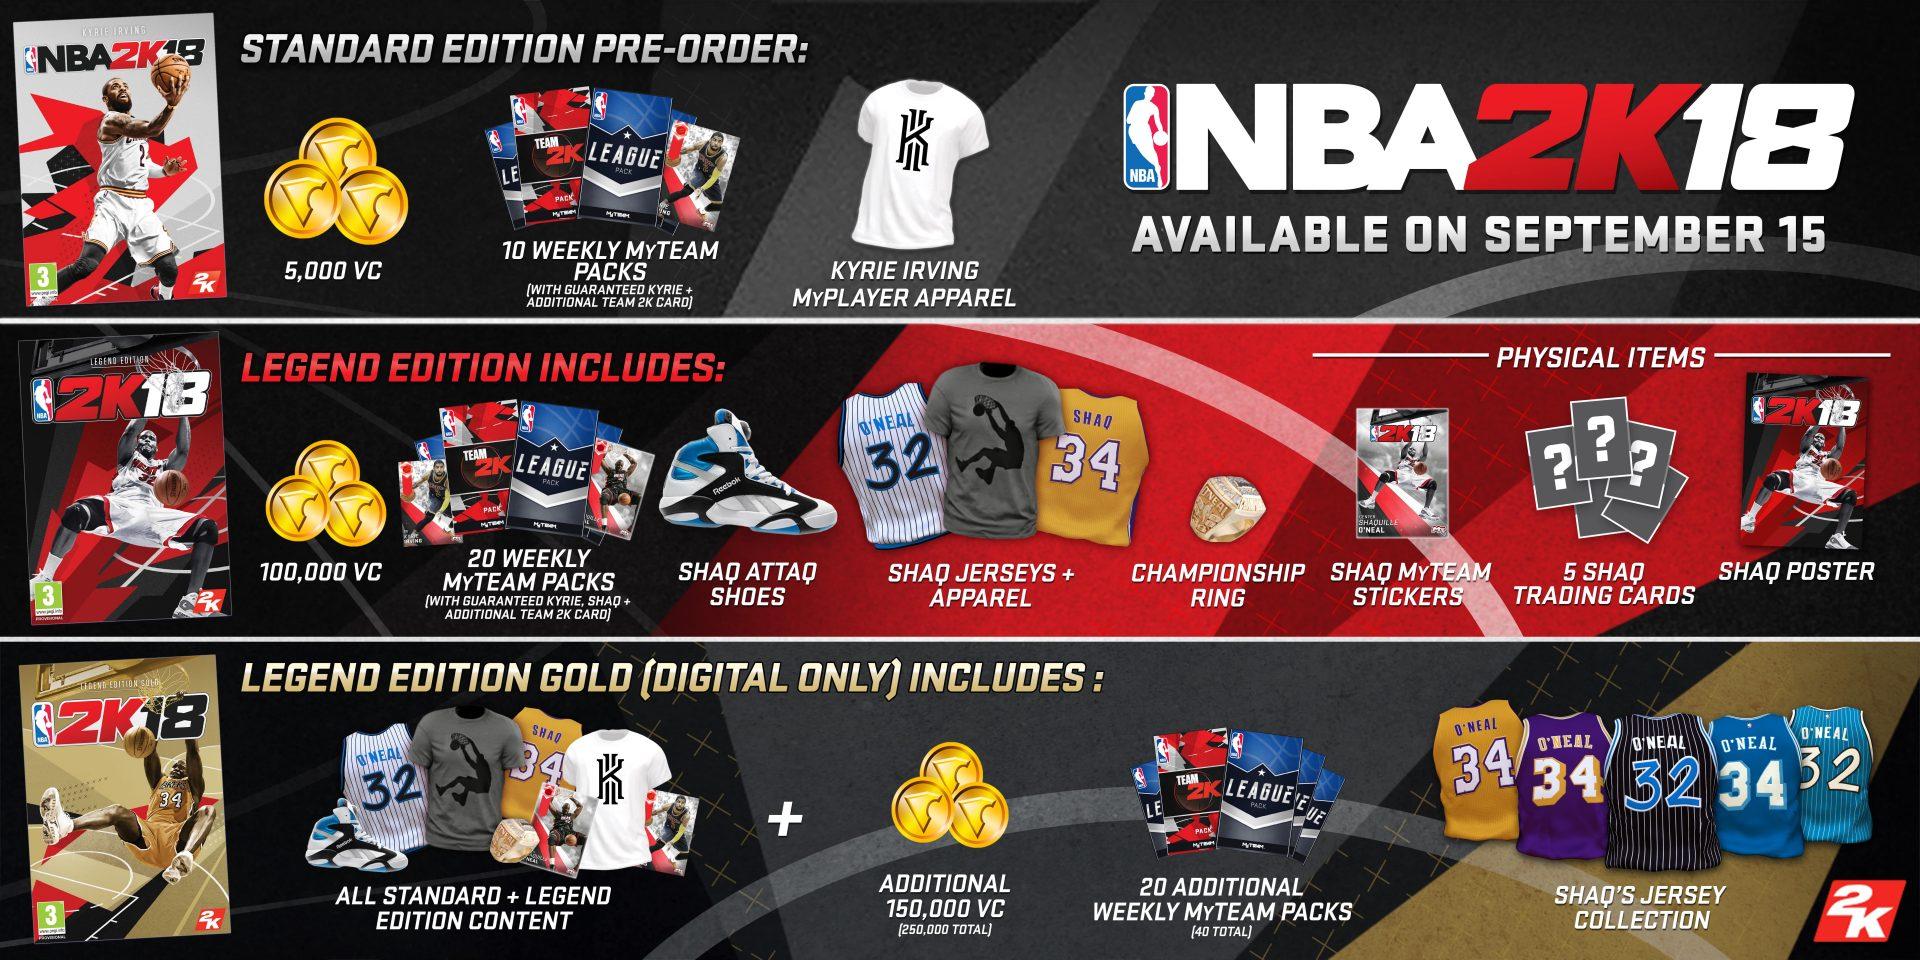 So Who's The Face Of NBA 2K18?